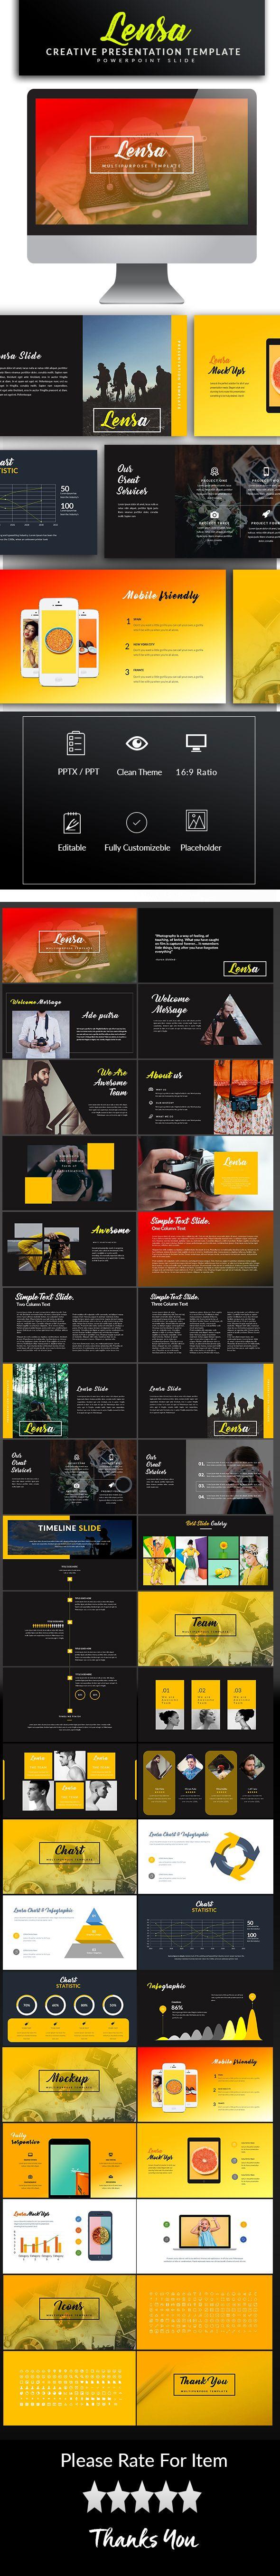 Lensa Powerpoint Template - PowerPoint Templates Presentation Templates